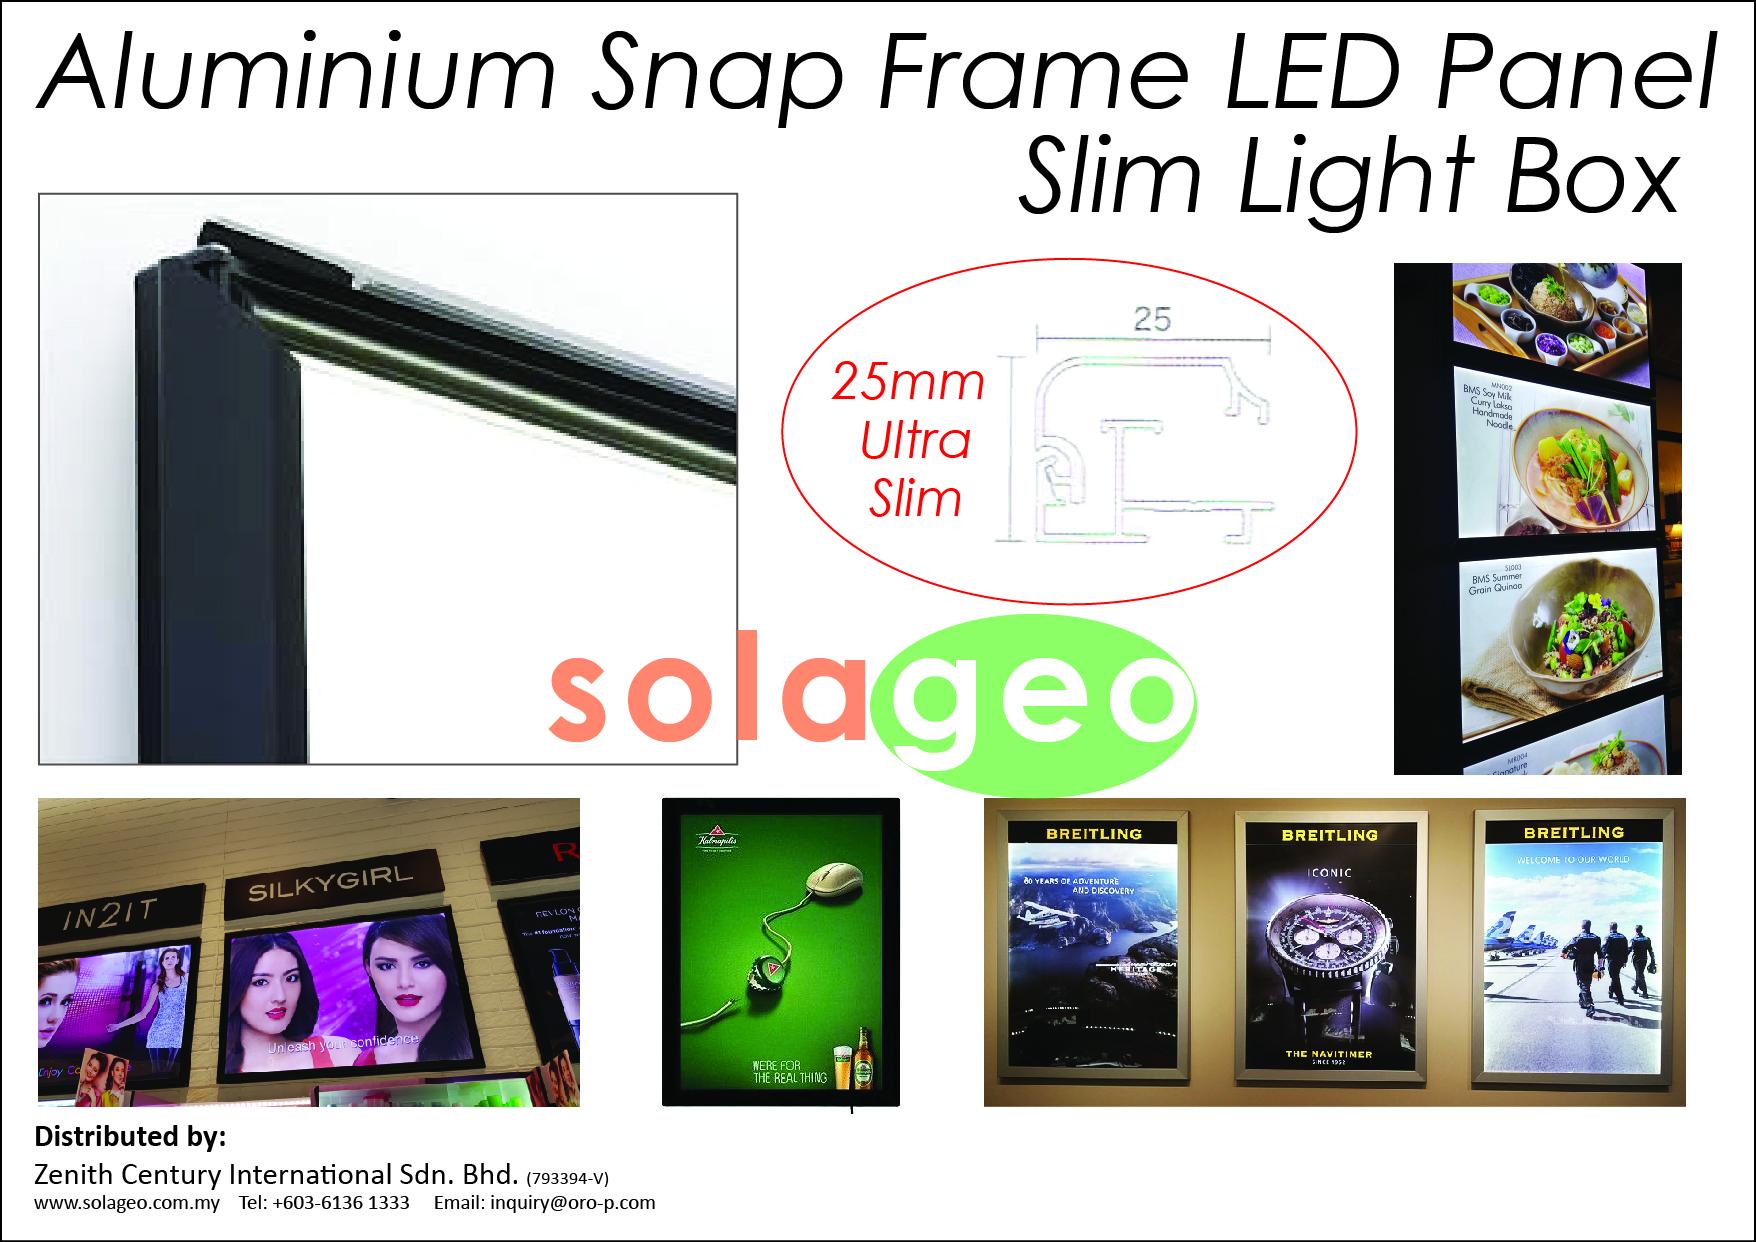 ALUMINIUM SNAP FRAME LED PANEL SLIM LIGHT BOX – ZENITH CENTURY ...